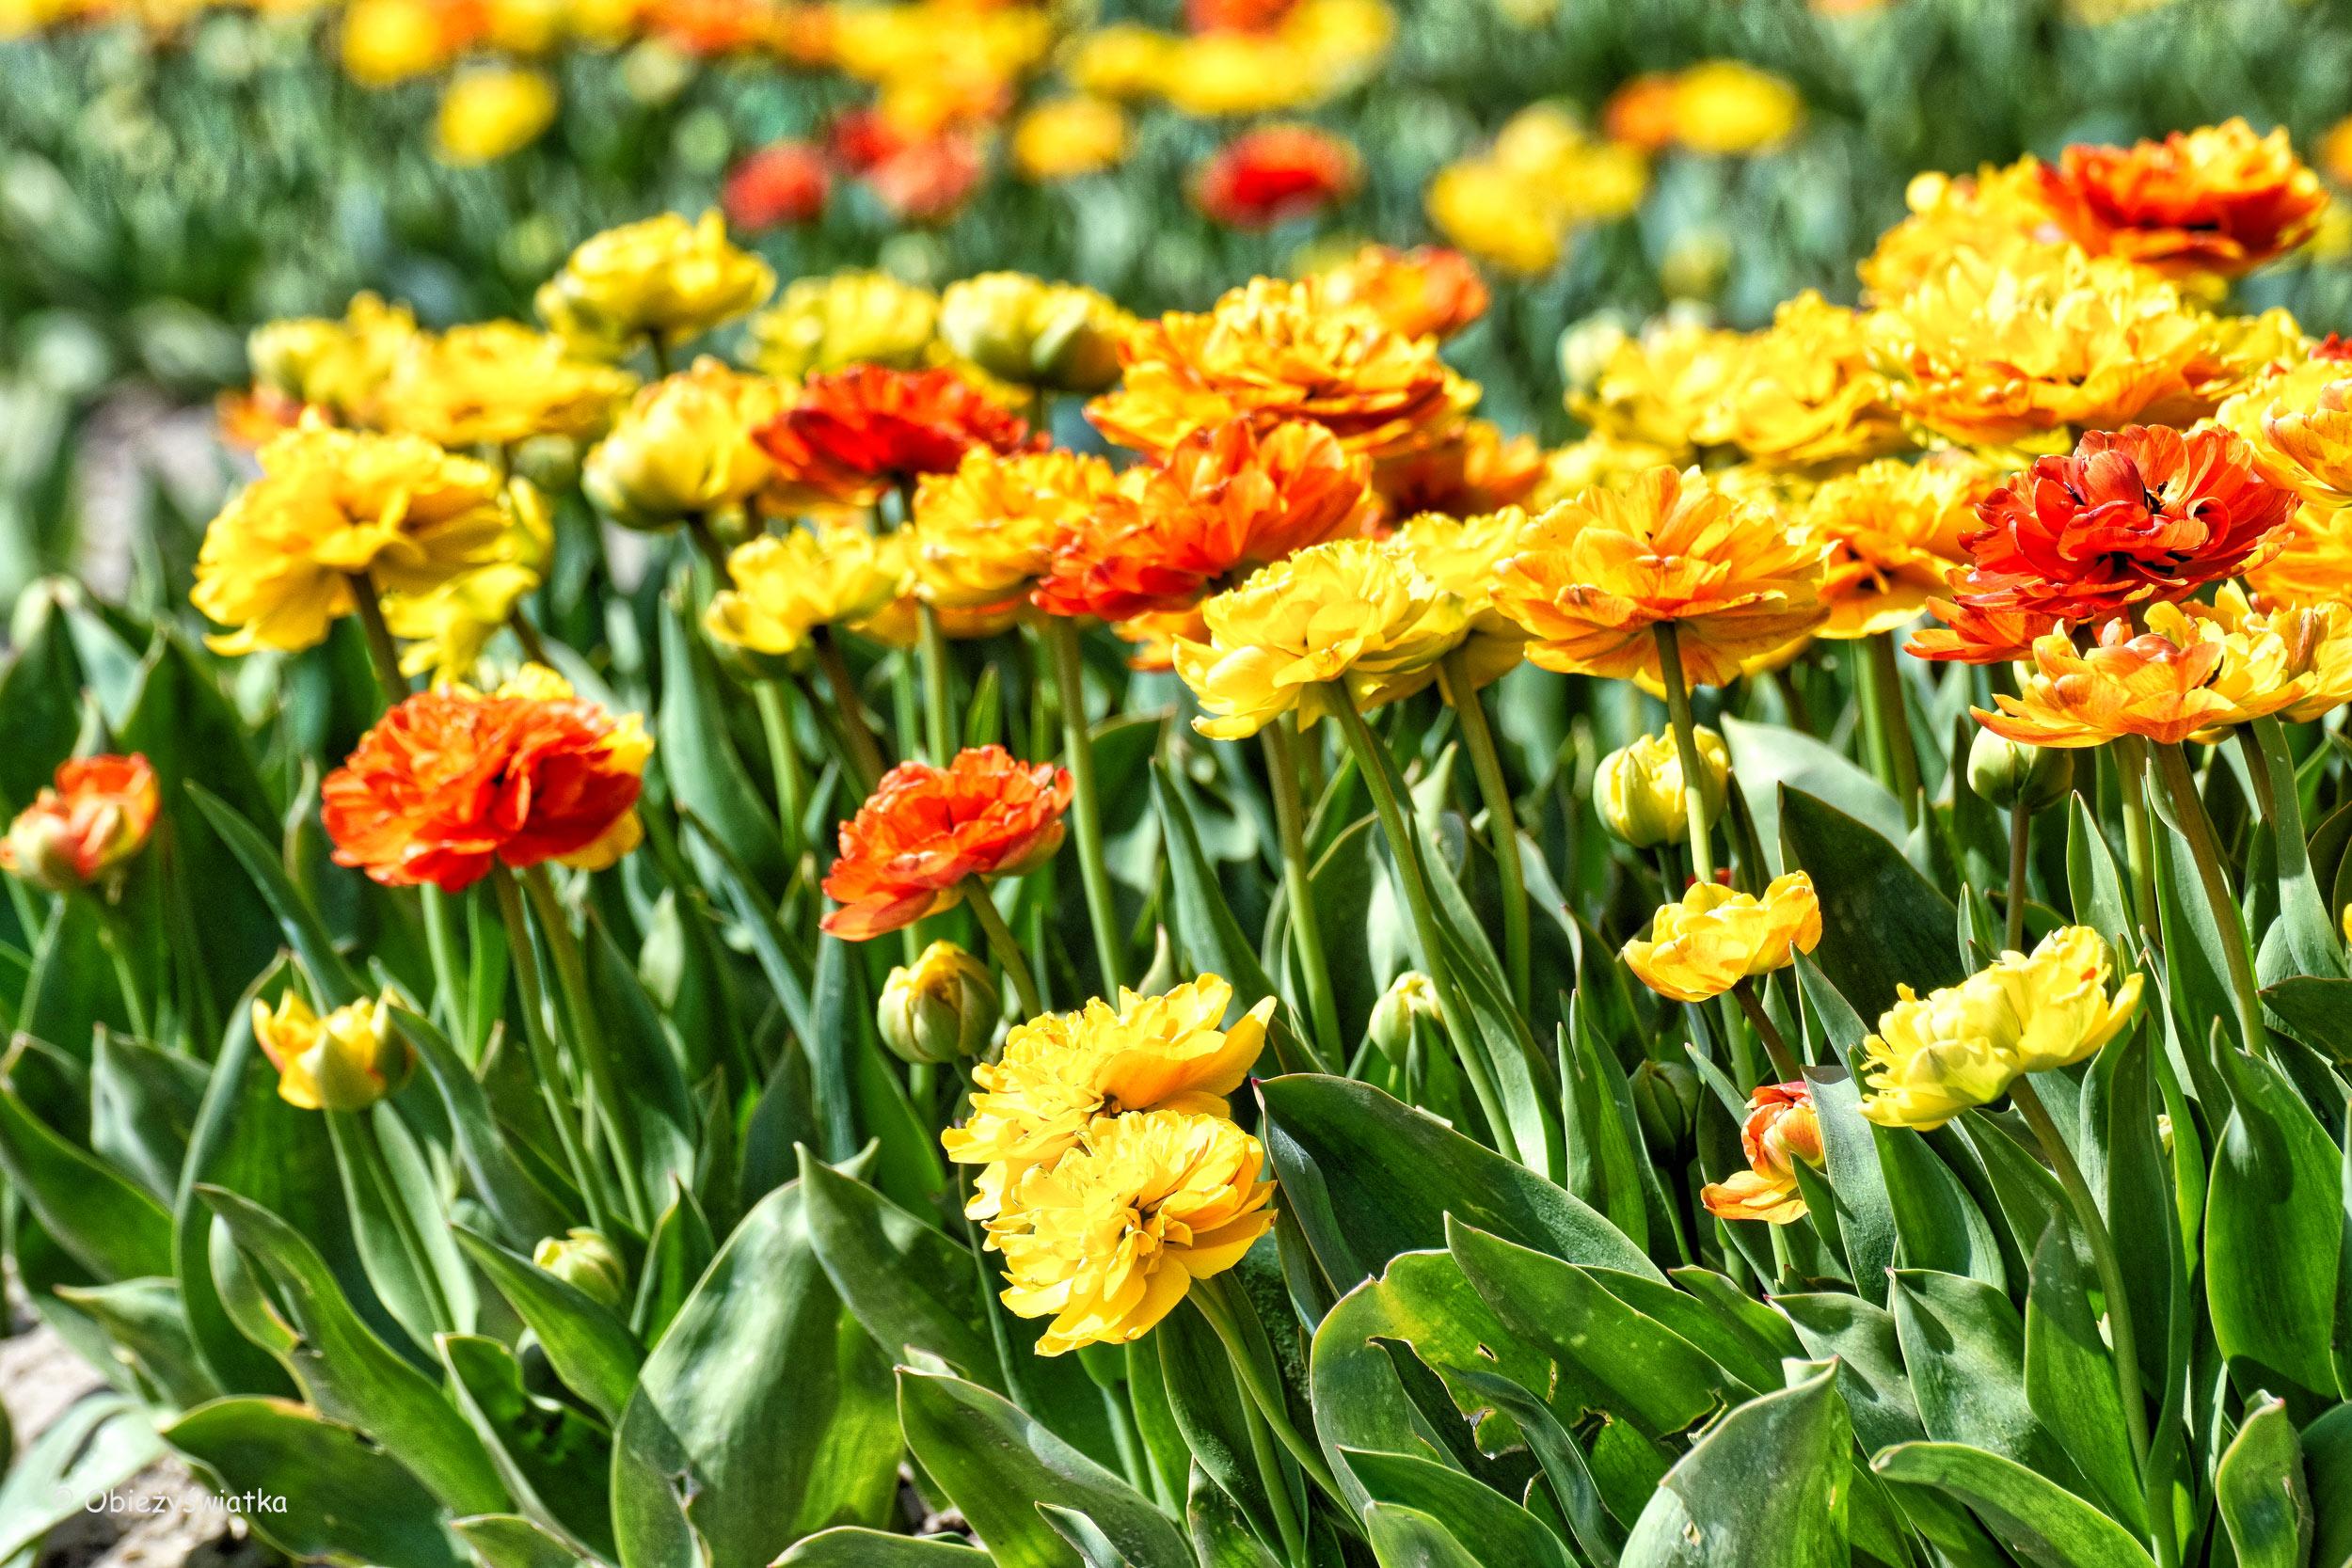 Pola w tulipanach, Holandia